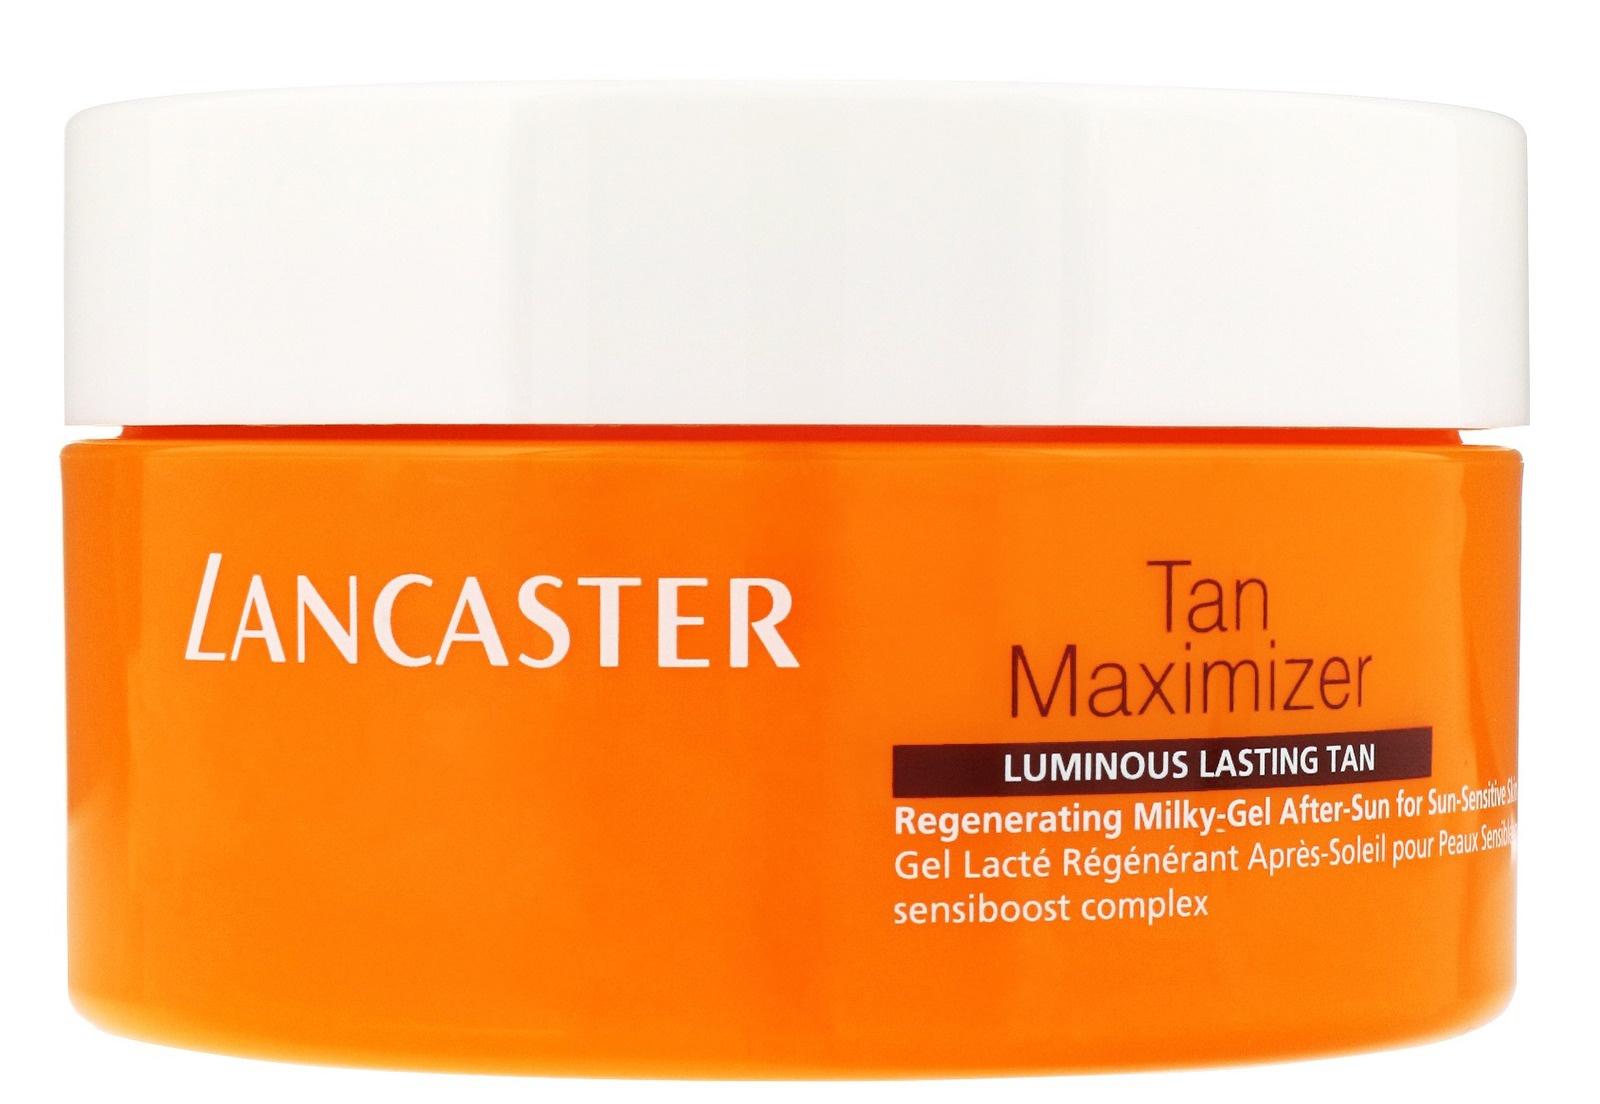 Lancaster Tan Maximizer Regenerating Milky Gel For Sun Sensitive Skin